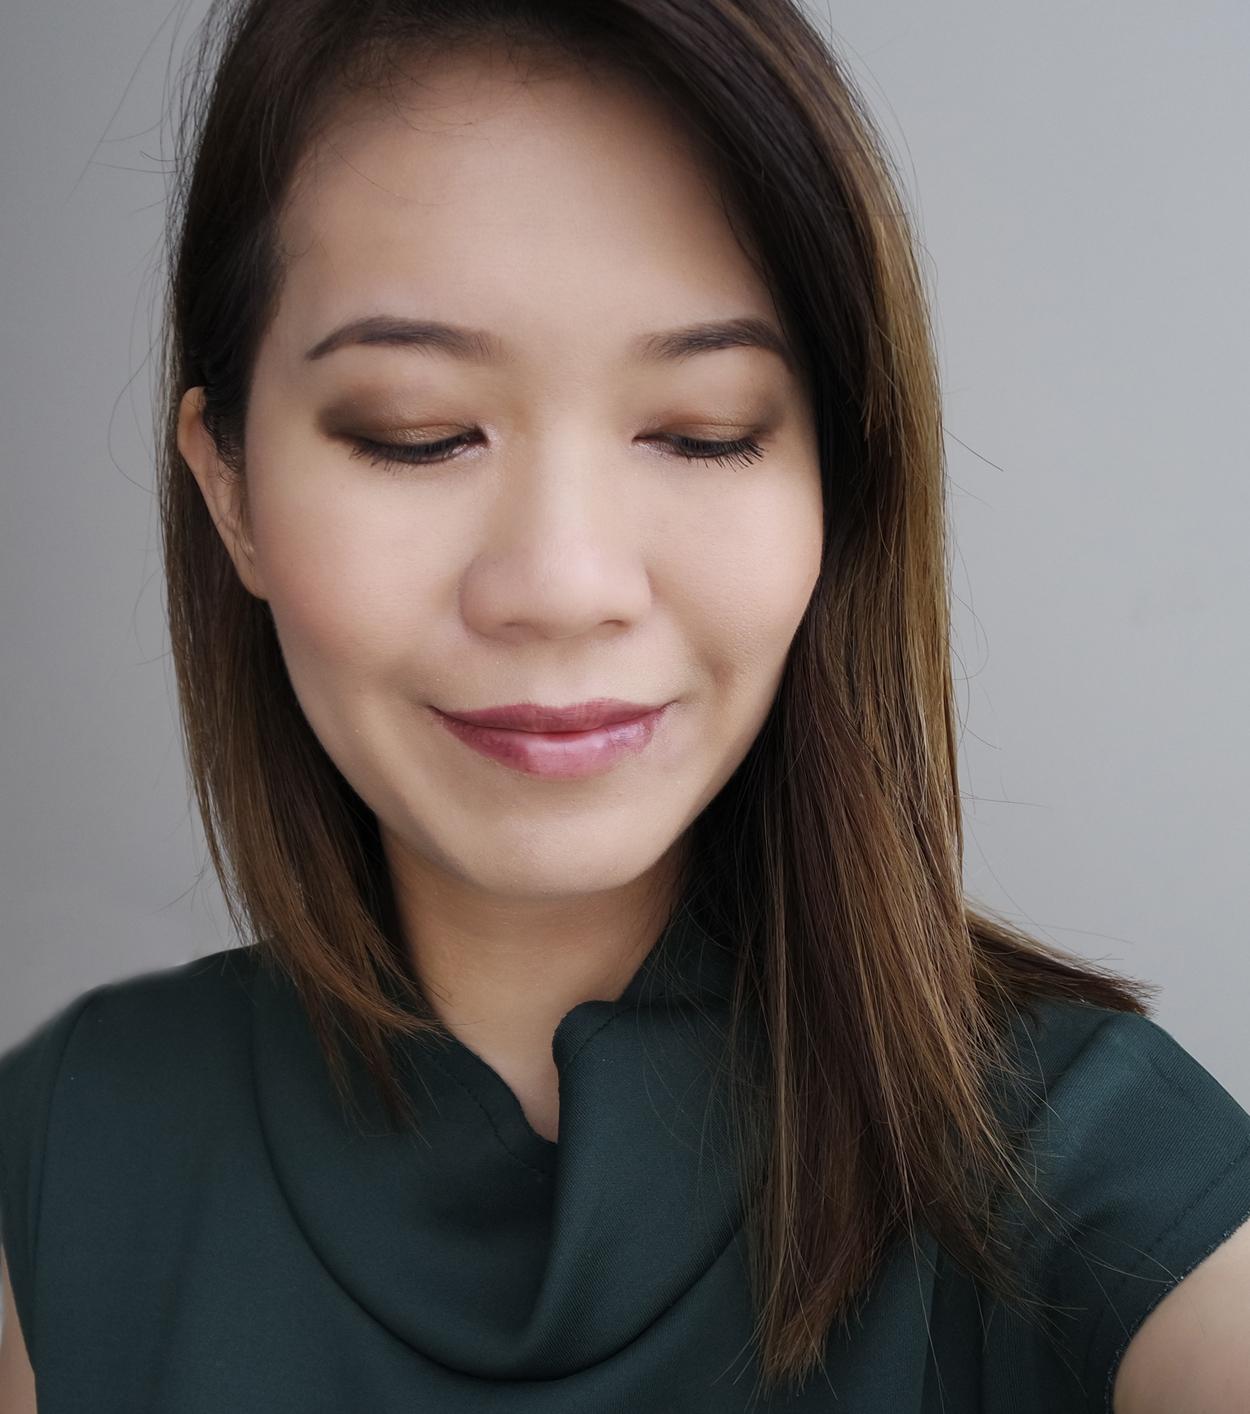 Chanel Les 4 Ombres Codes Subtil makeup look